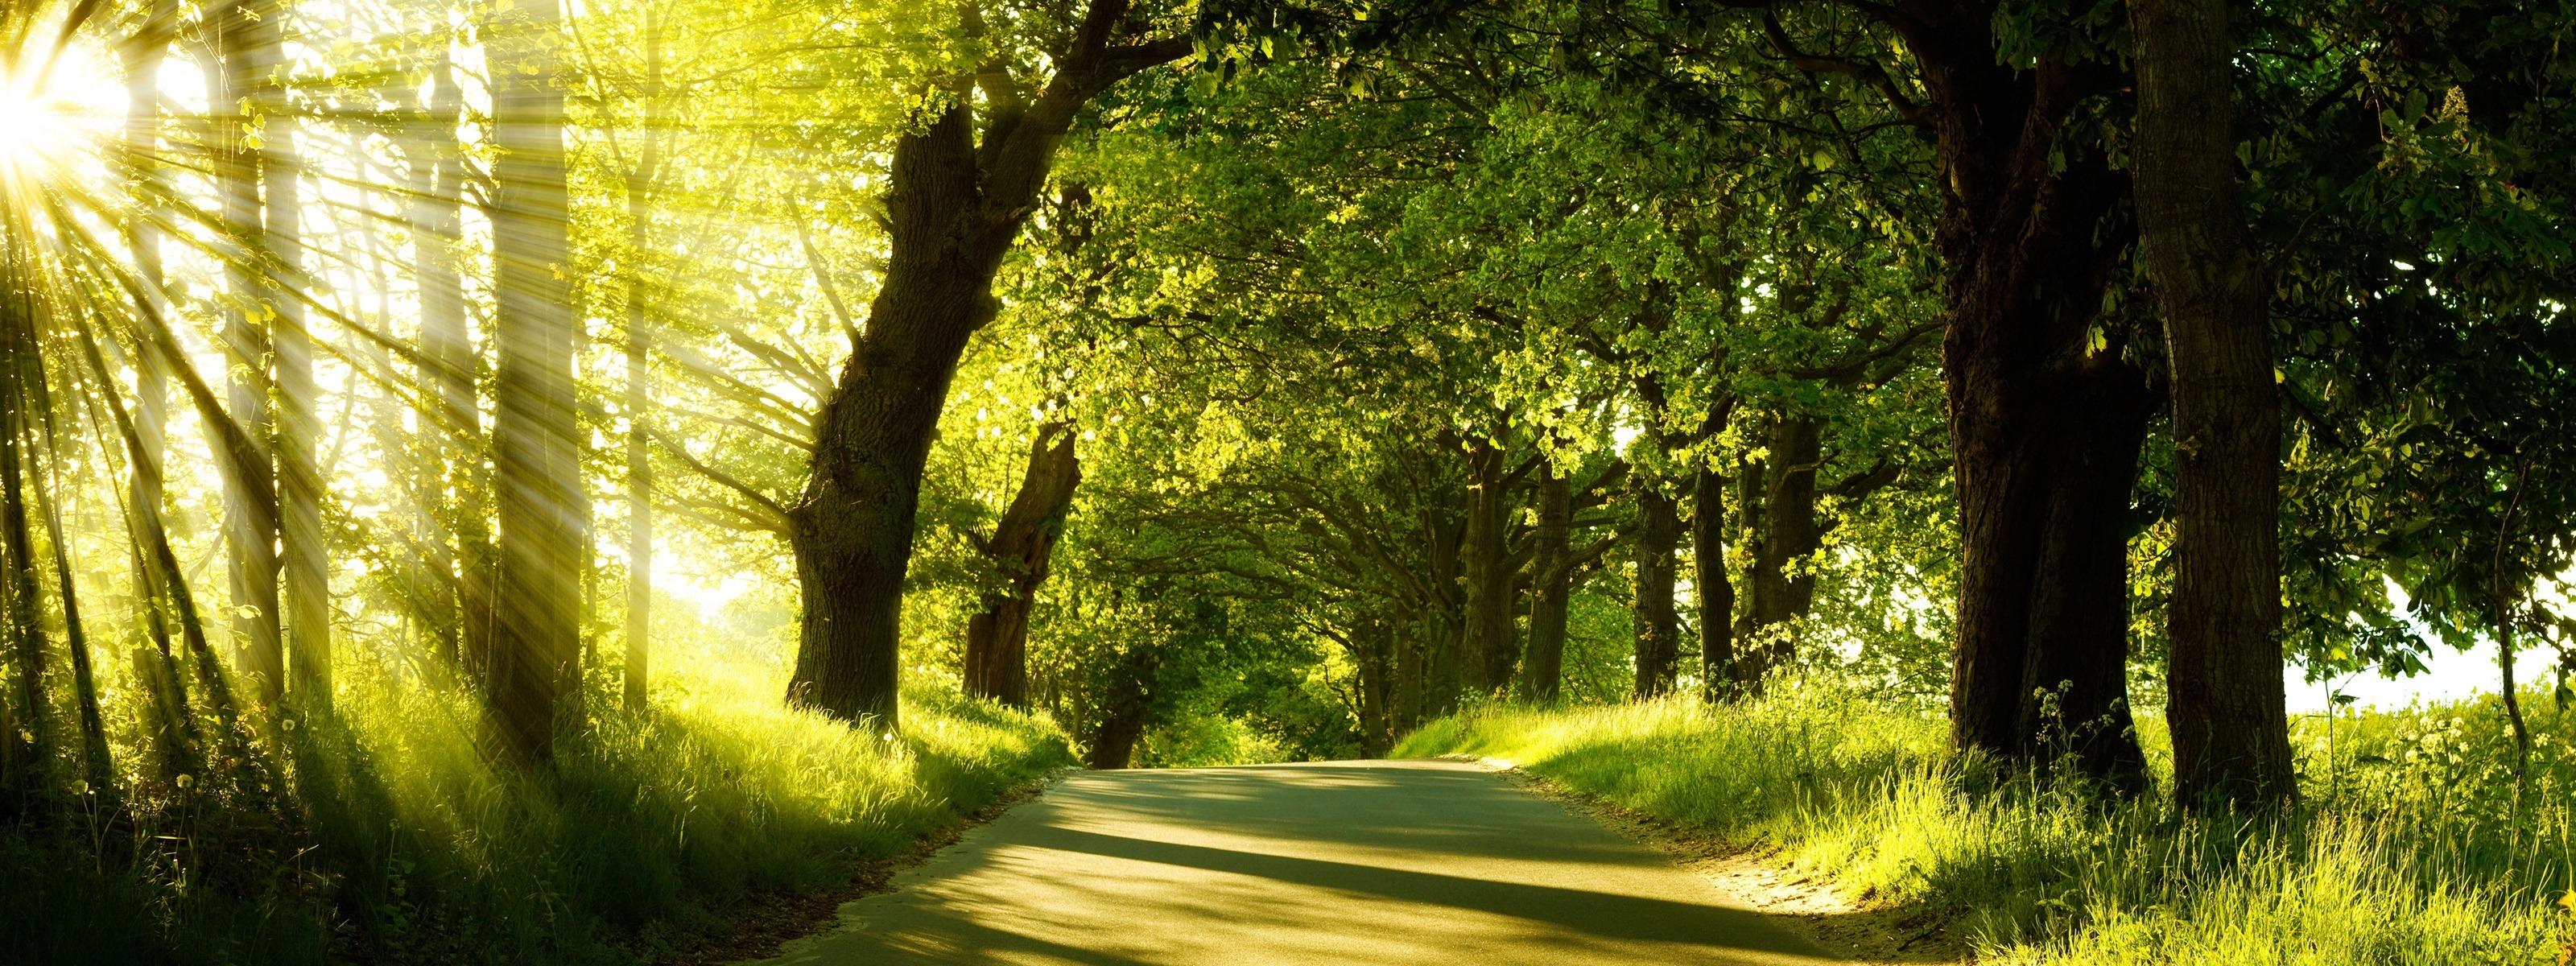 Nature HD Wallpapers, Free Wallpaper Downloads, Nature HD ...